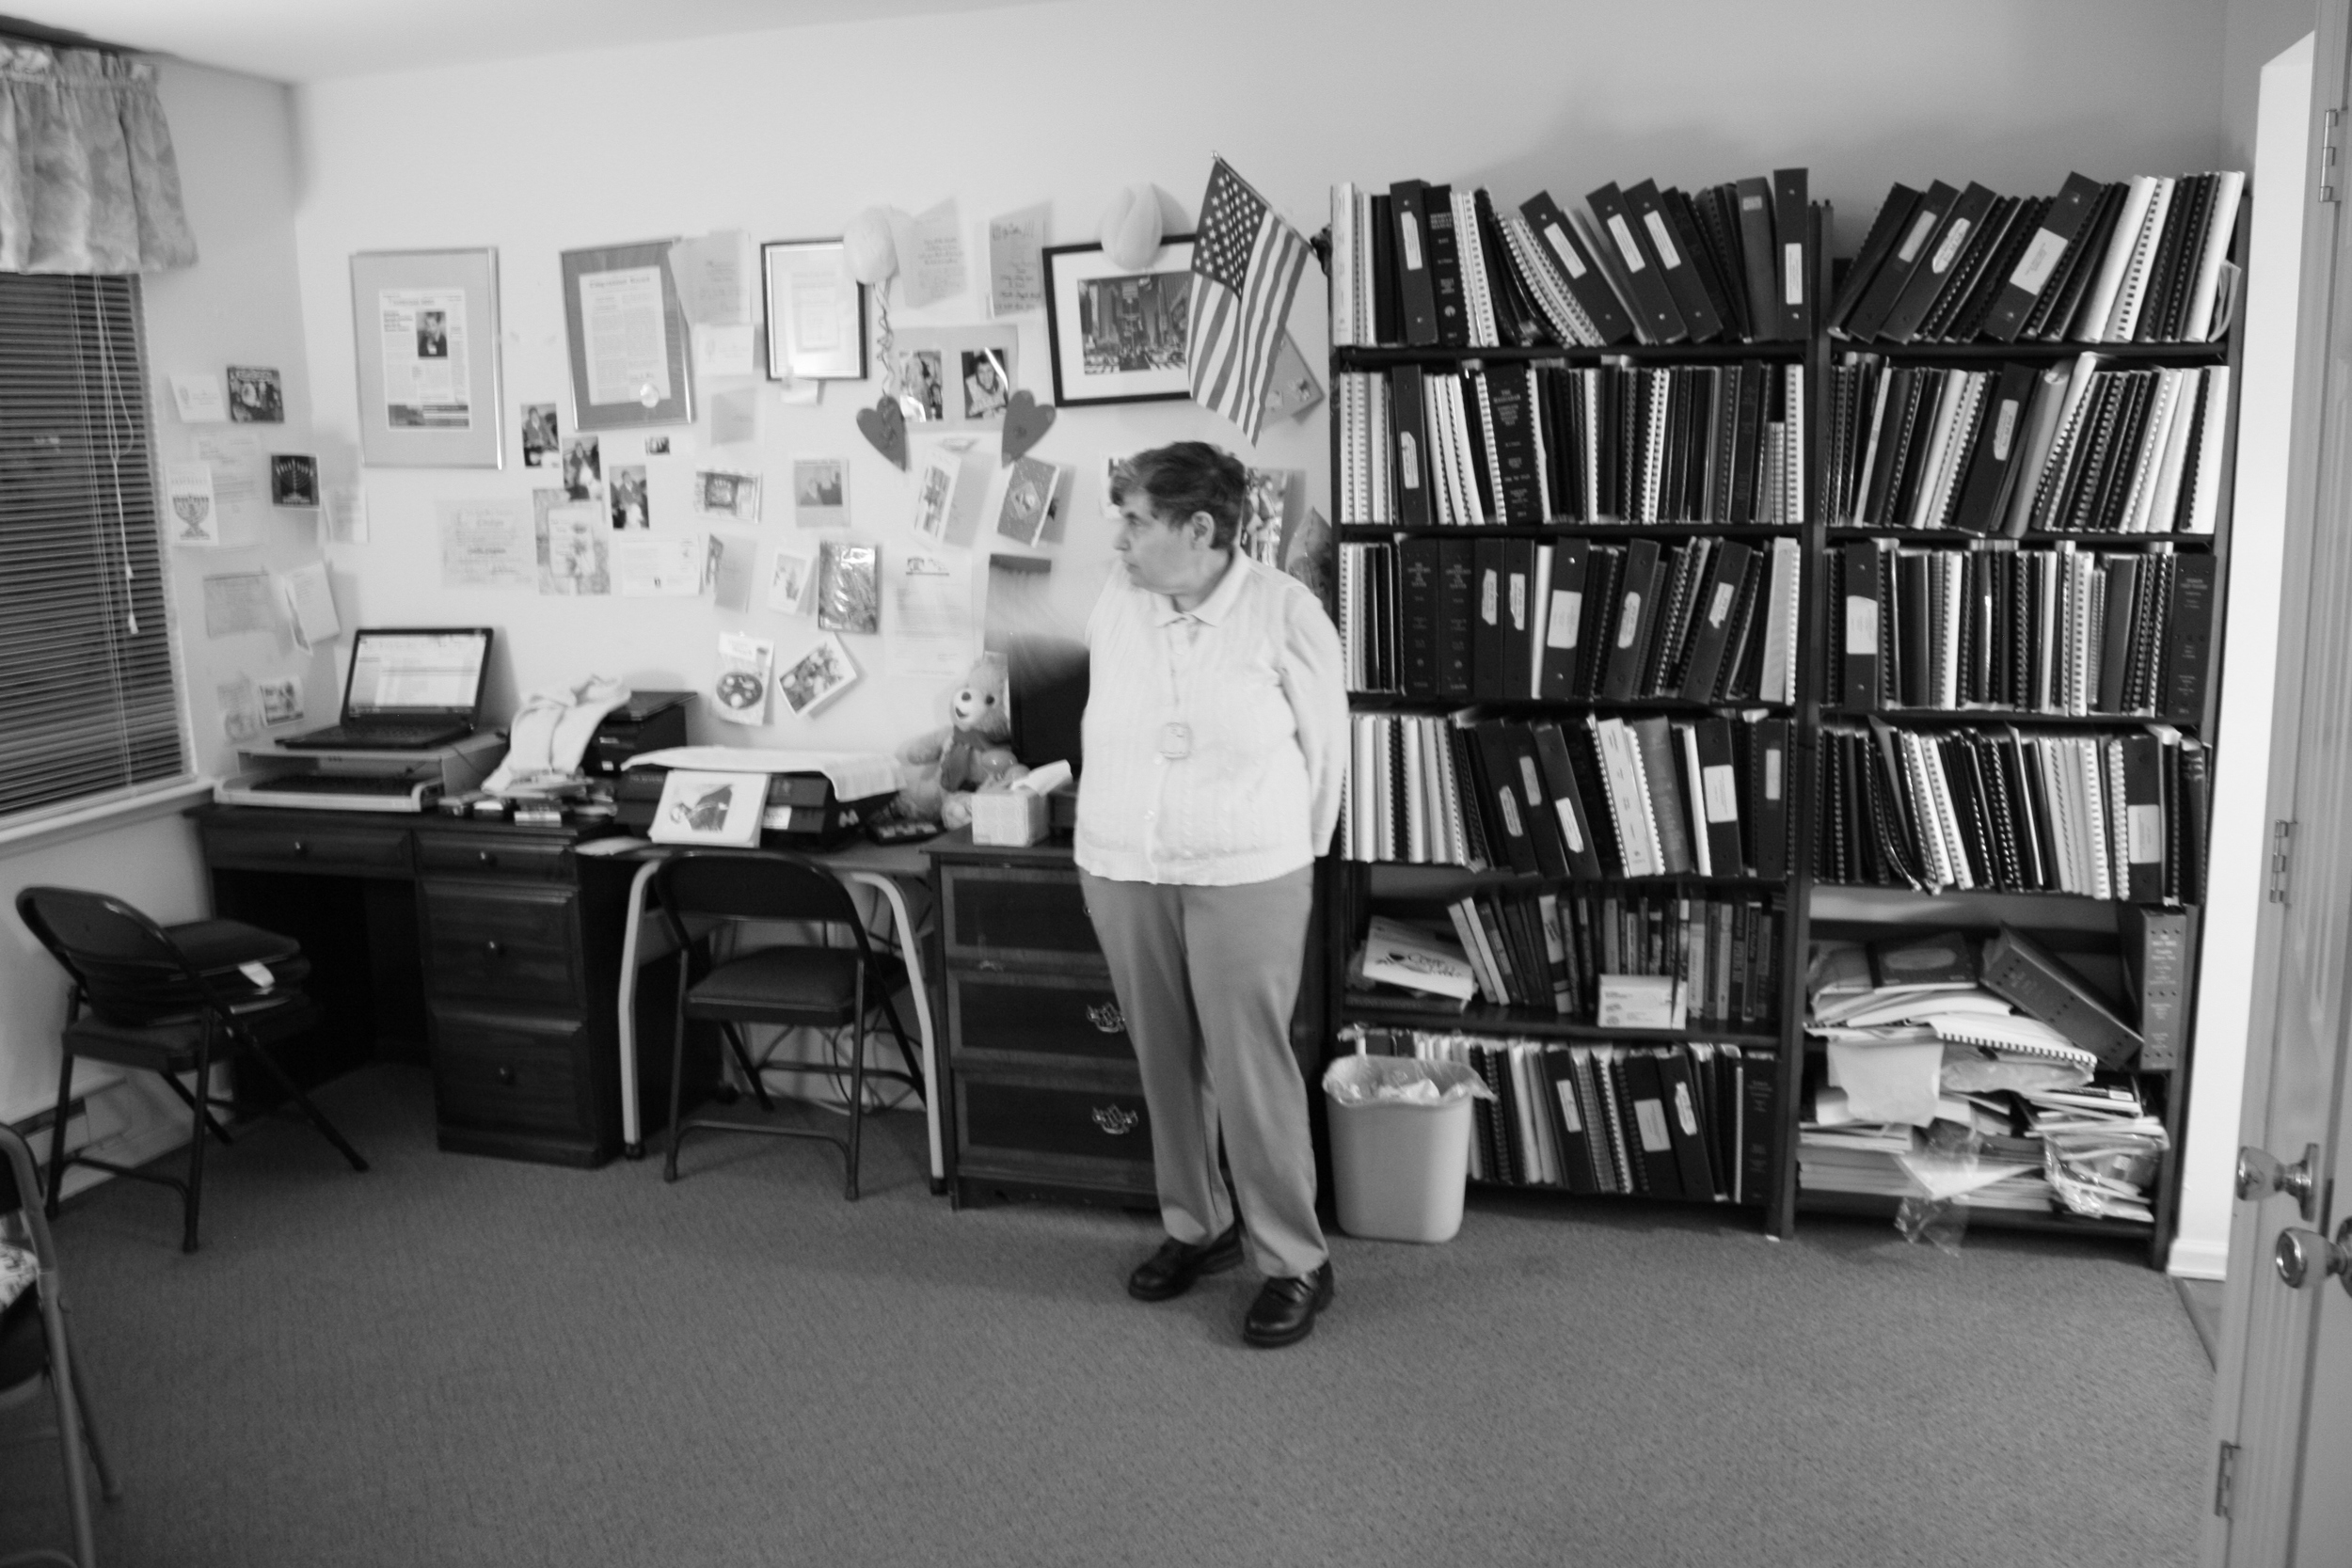 Cynthia showcasing her office and bookshelf